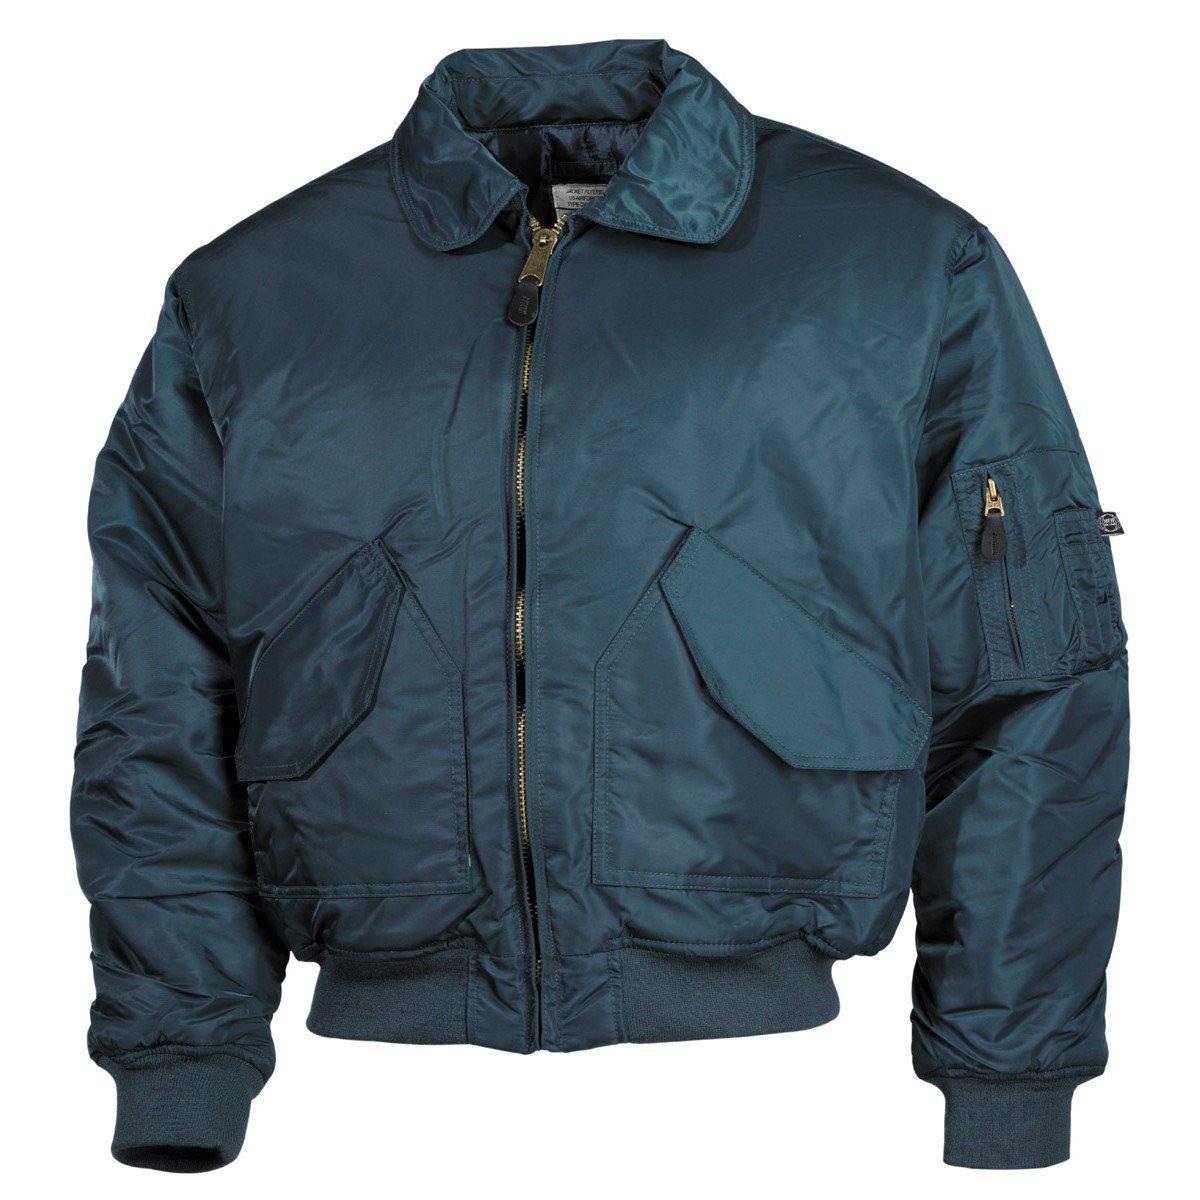 MFH CWU bomber pilot dzseki, kék Kék   Ruházat Dzsekik